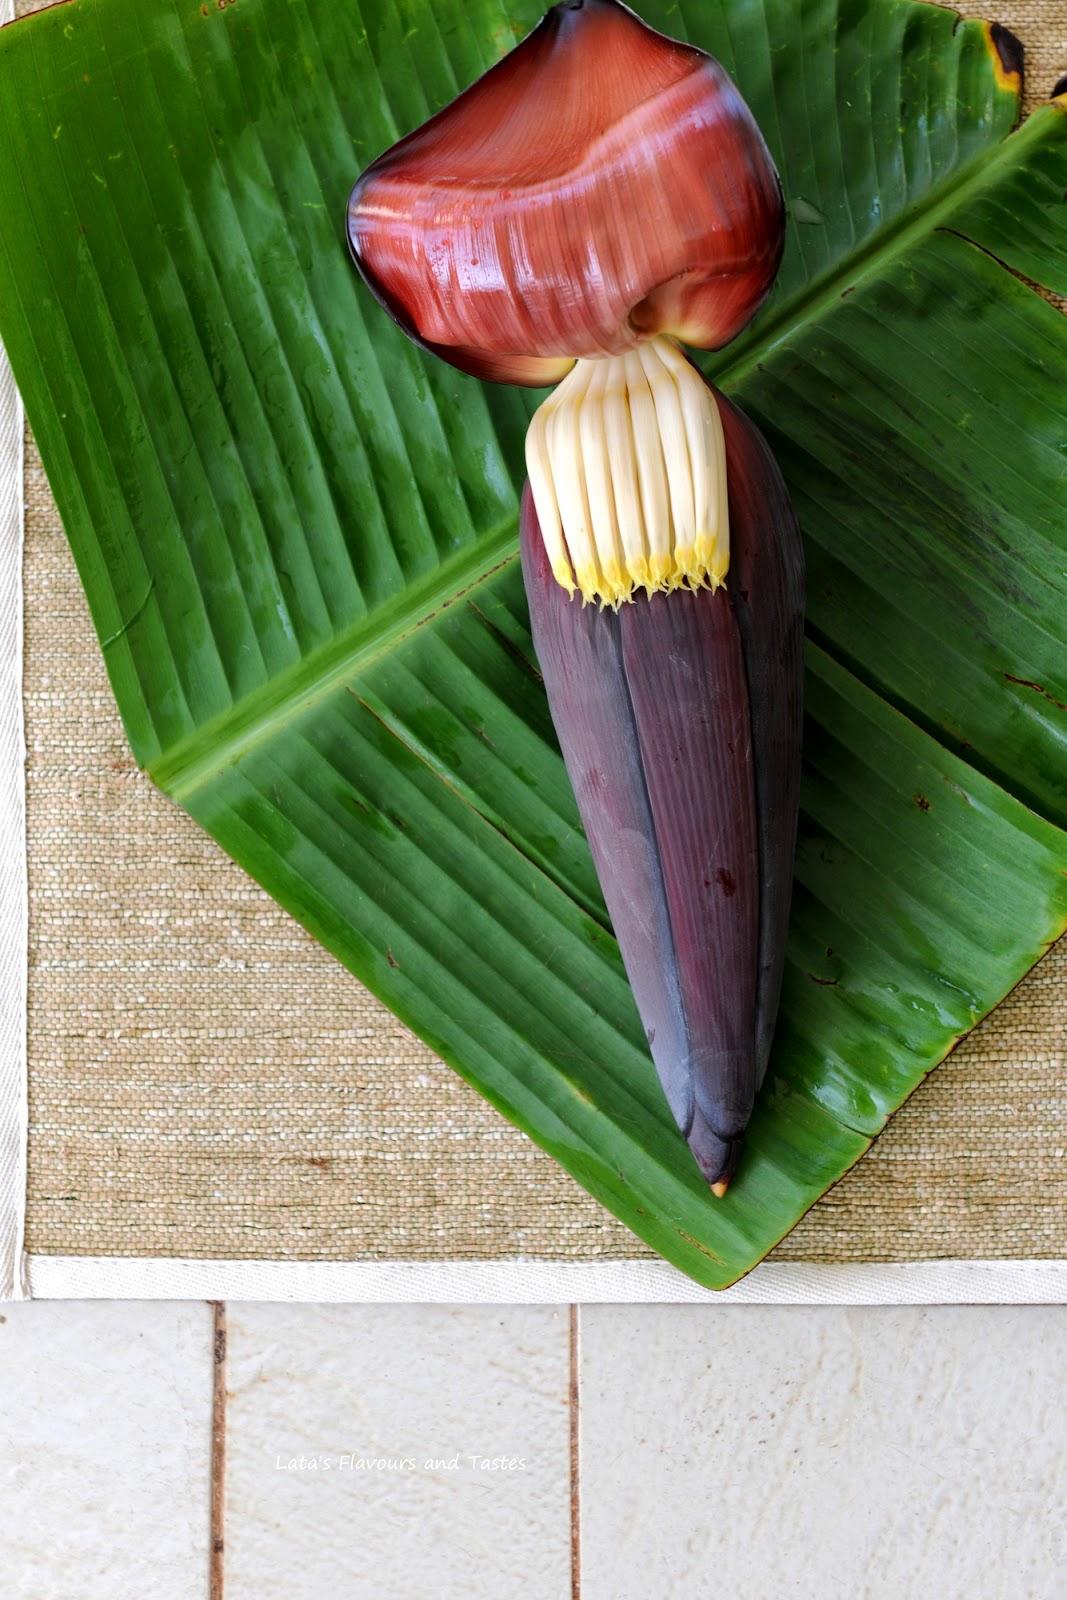 how to cook banana blossom